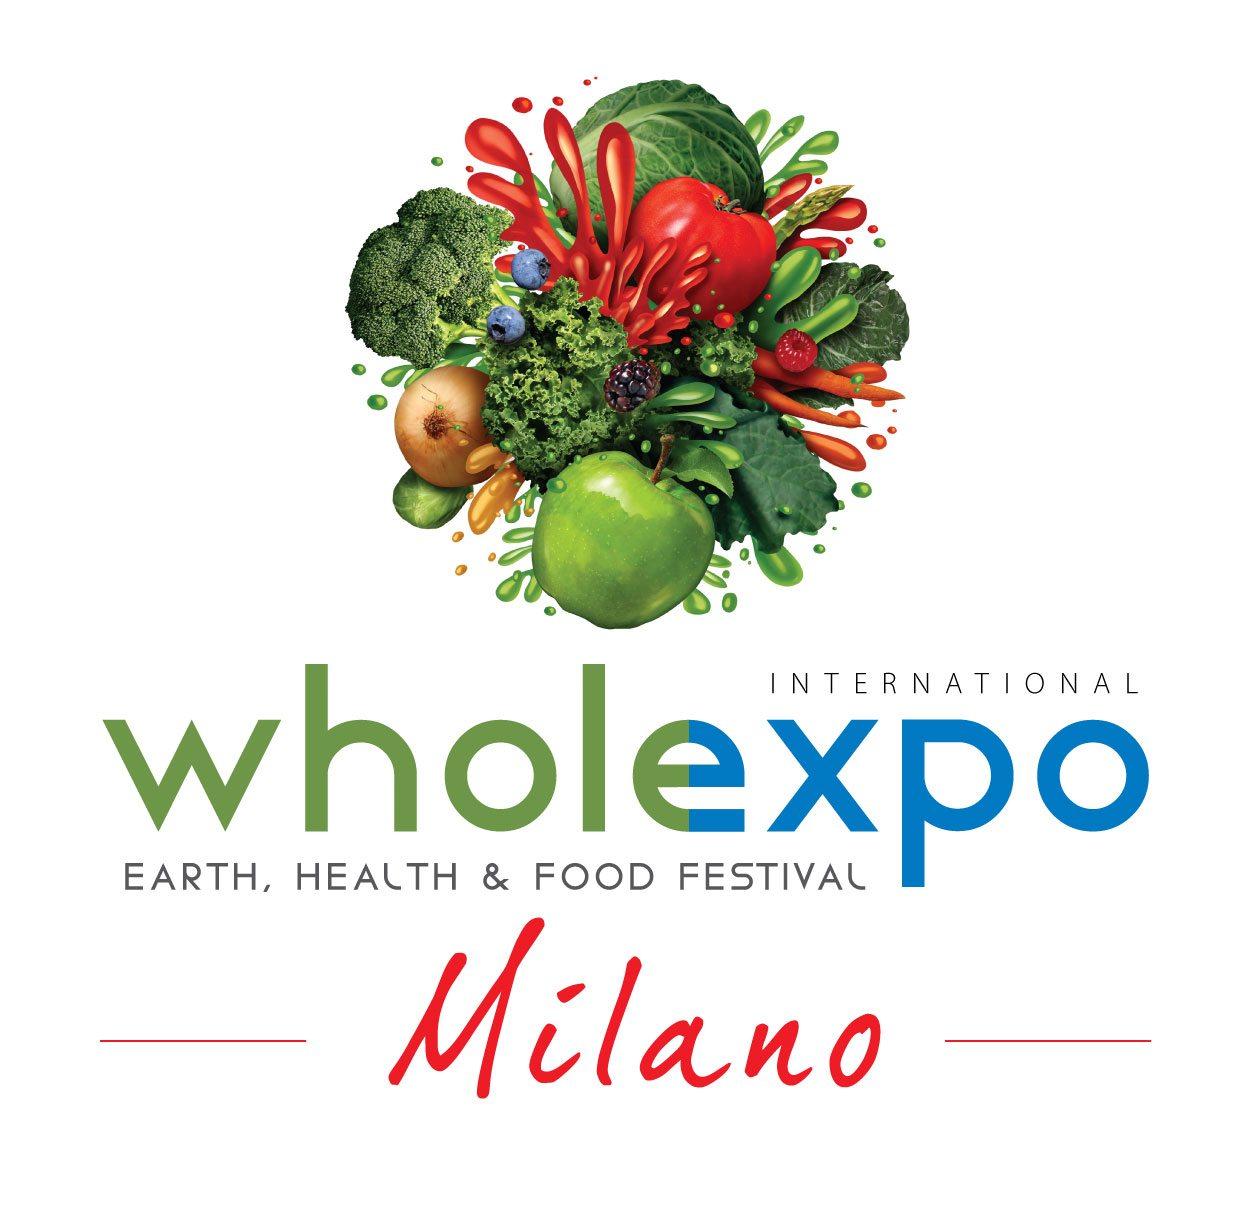 WFPB.ORG | Wholexpo Milano